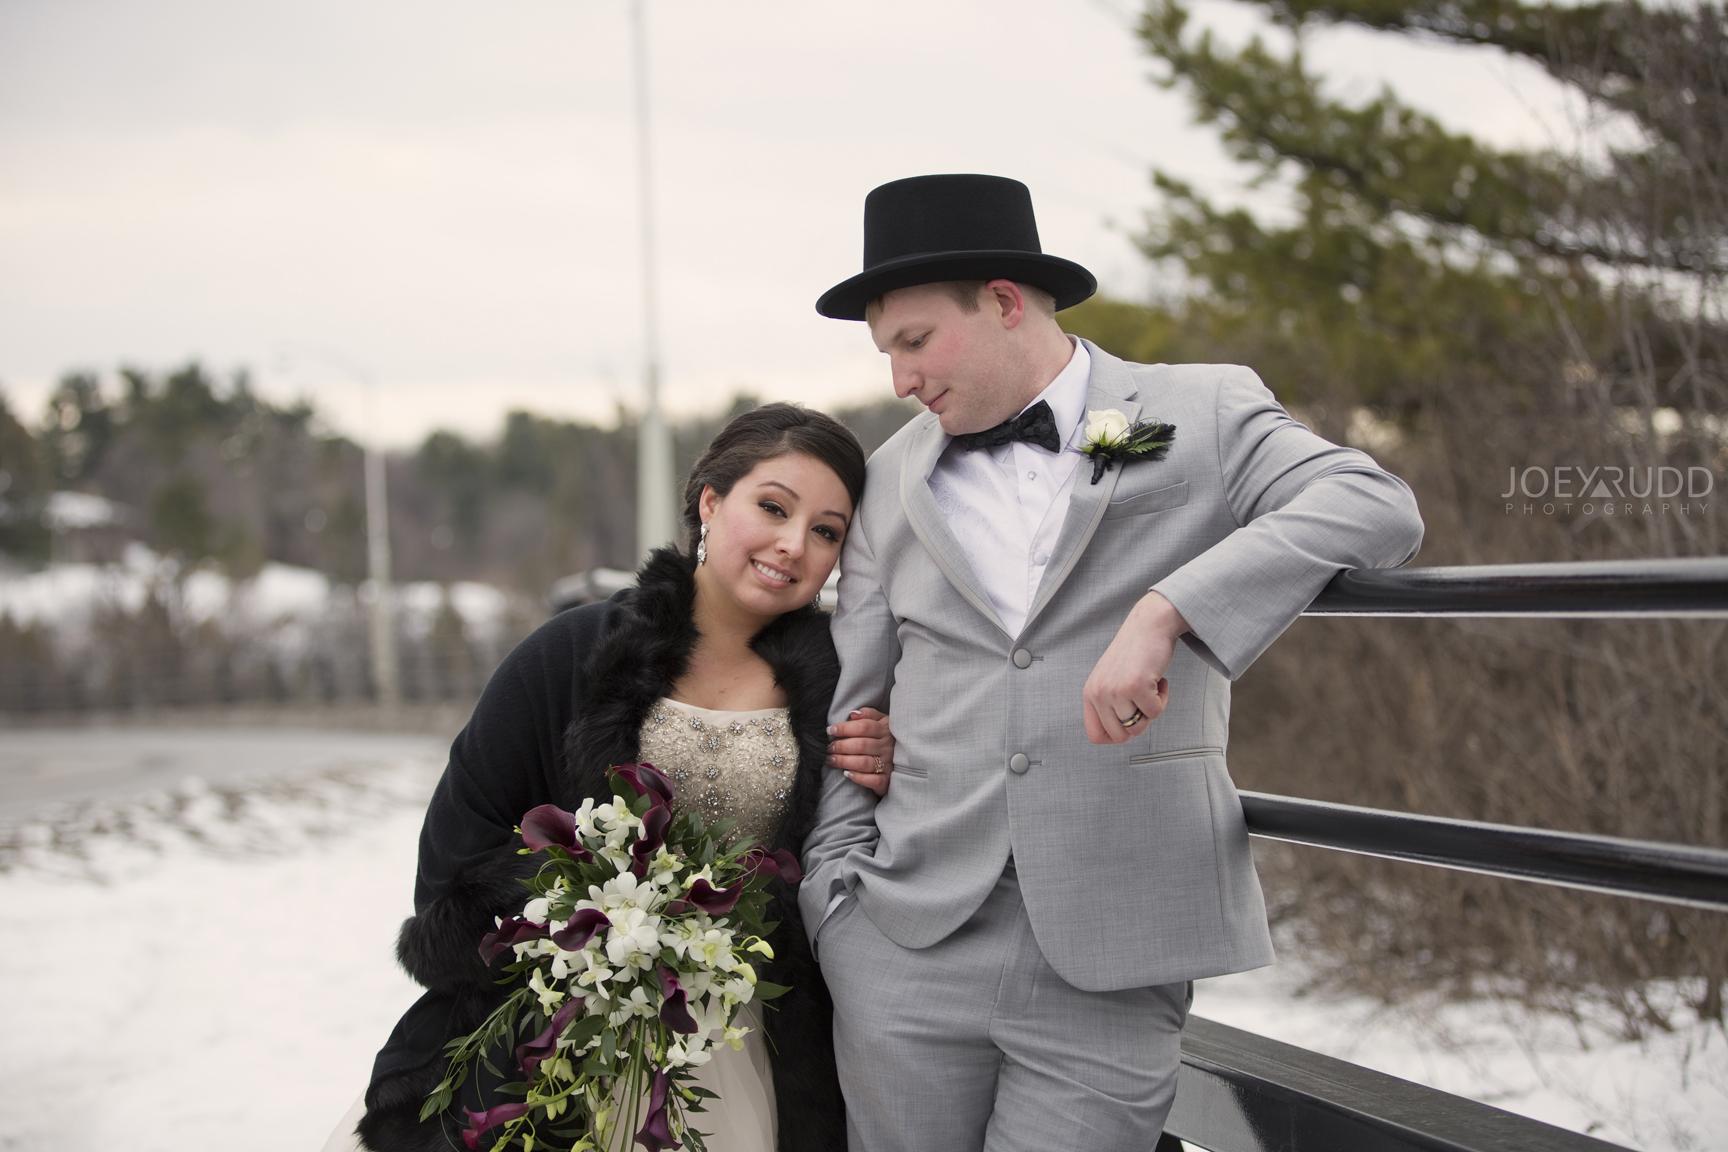 Fun Wedding Photography Ottawa Joey Rudd